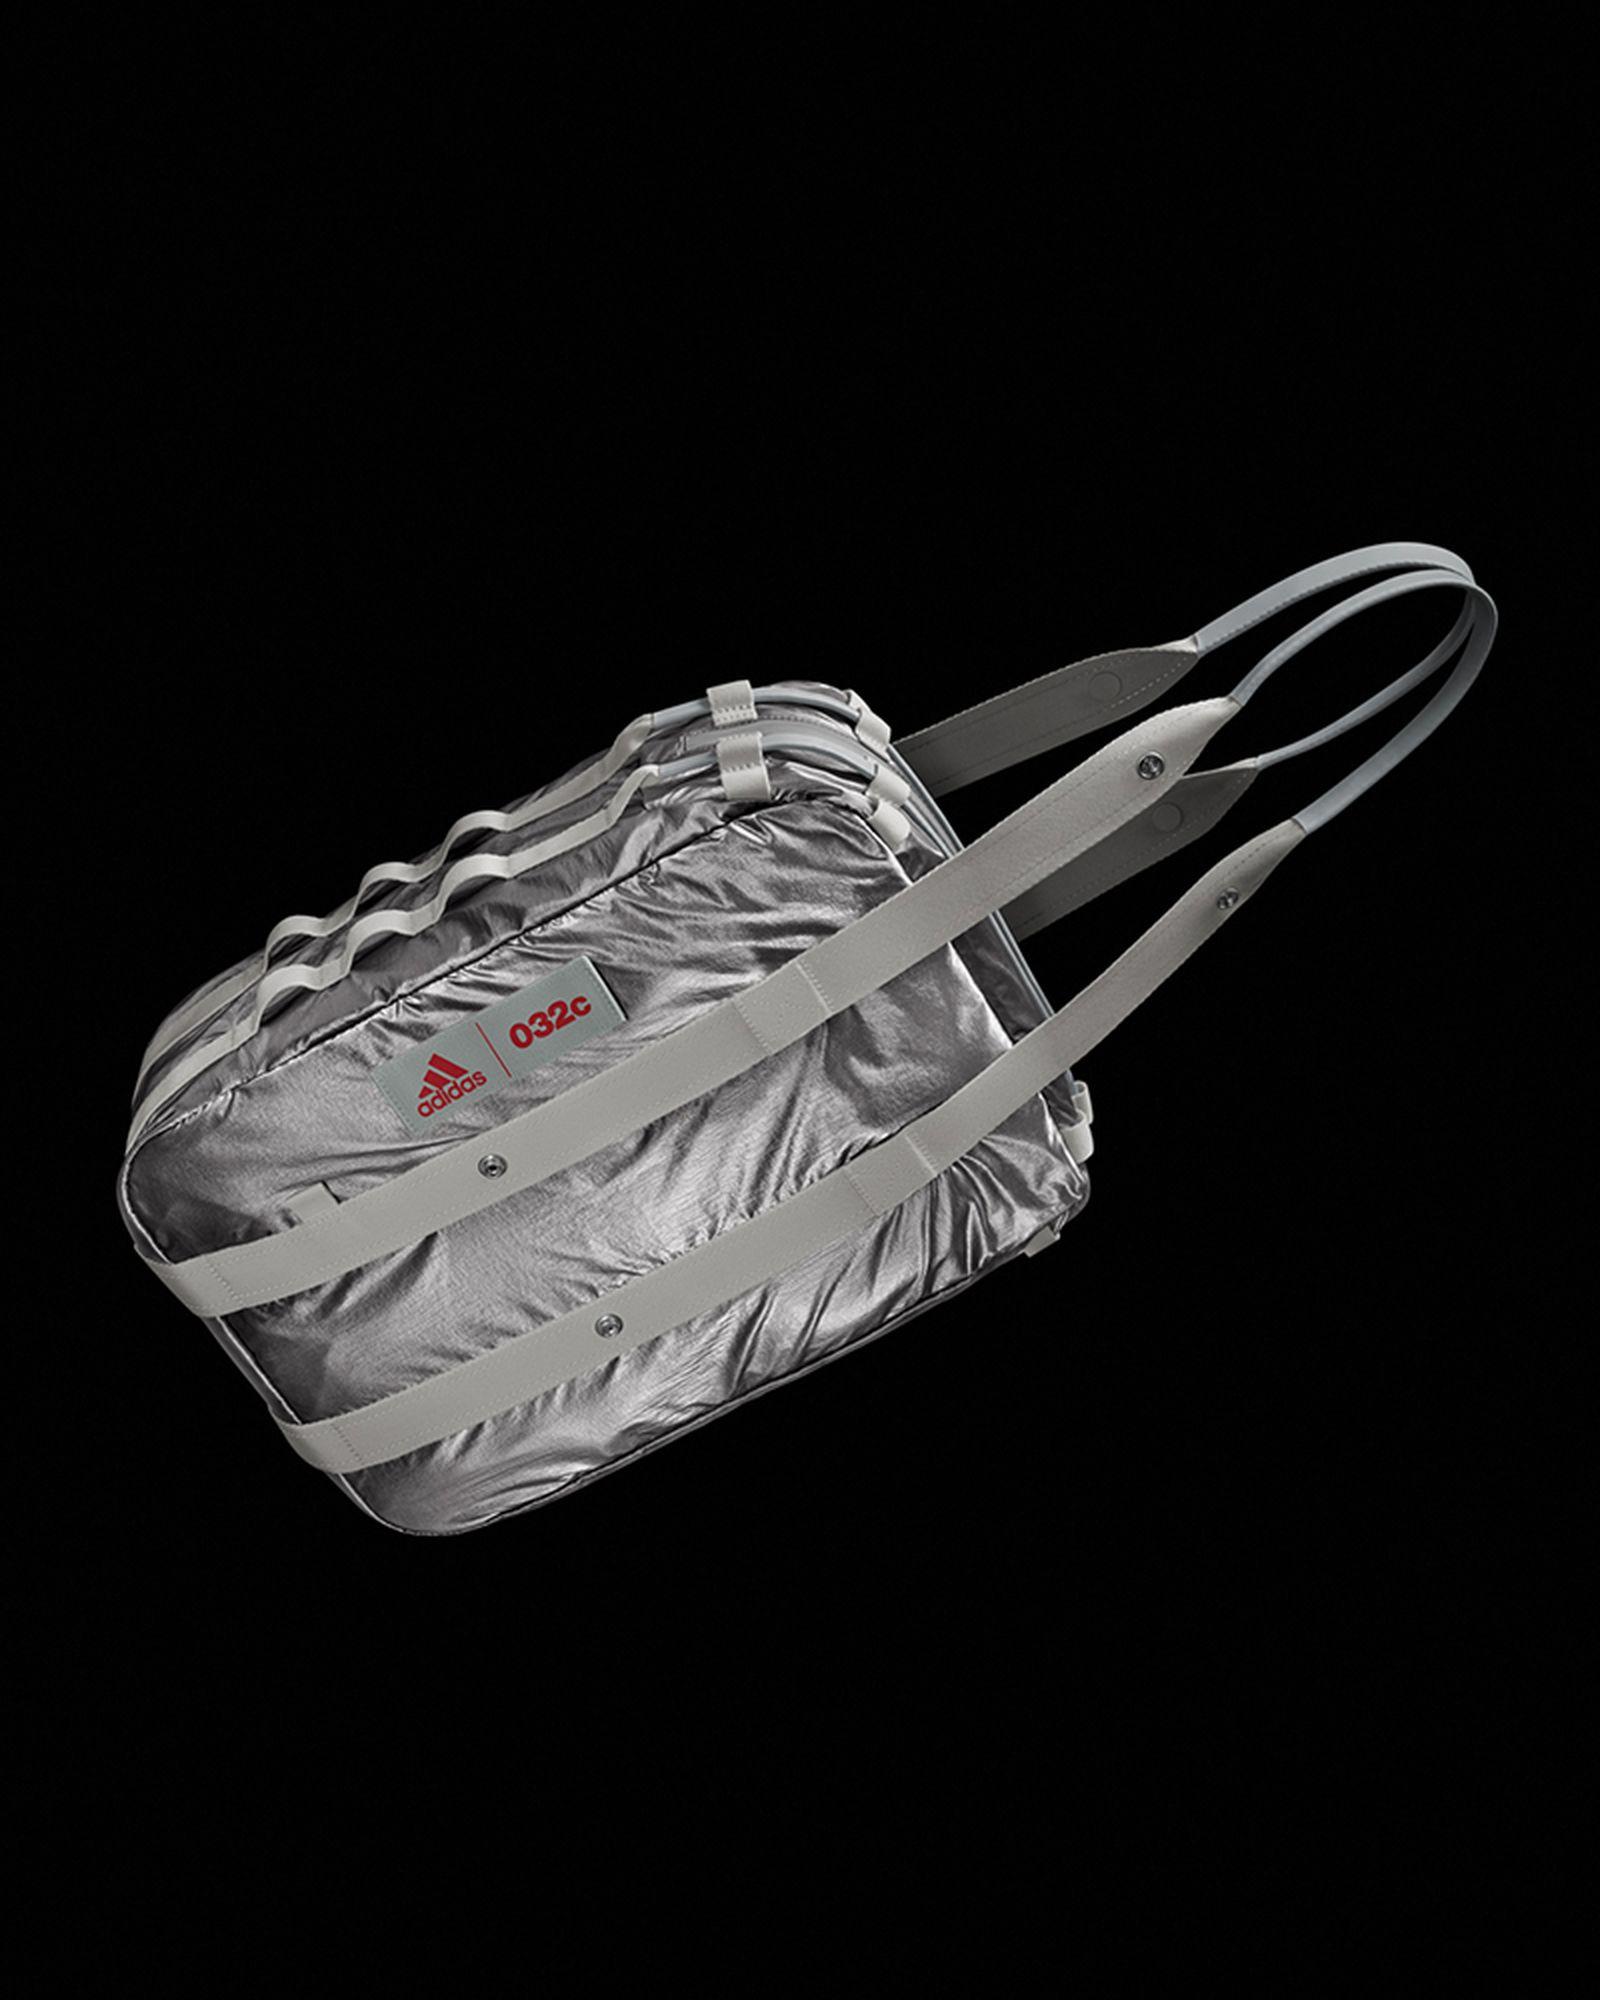 032c-adidas-07